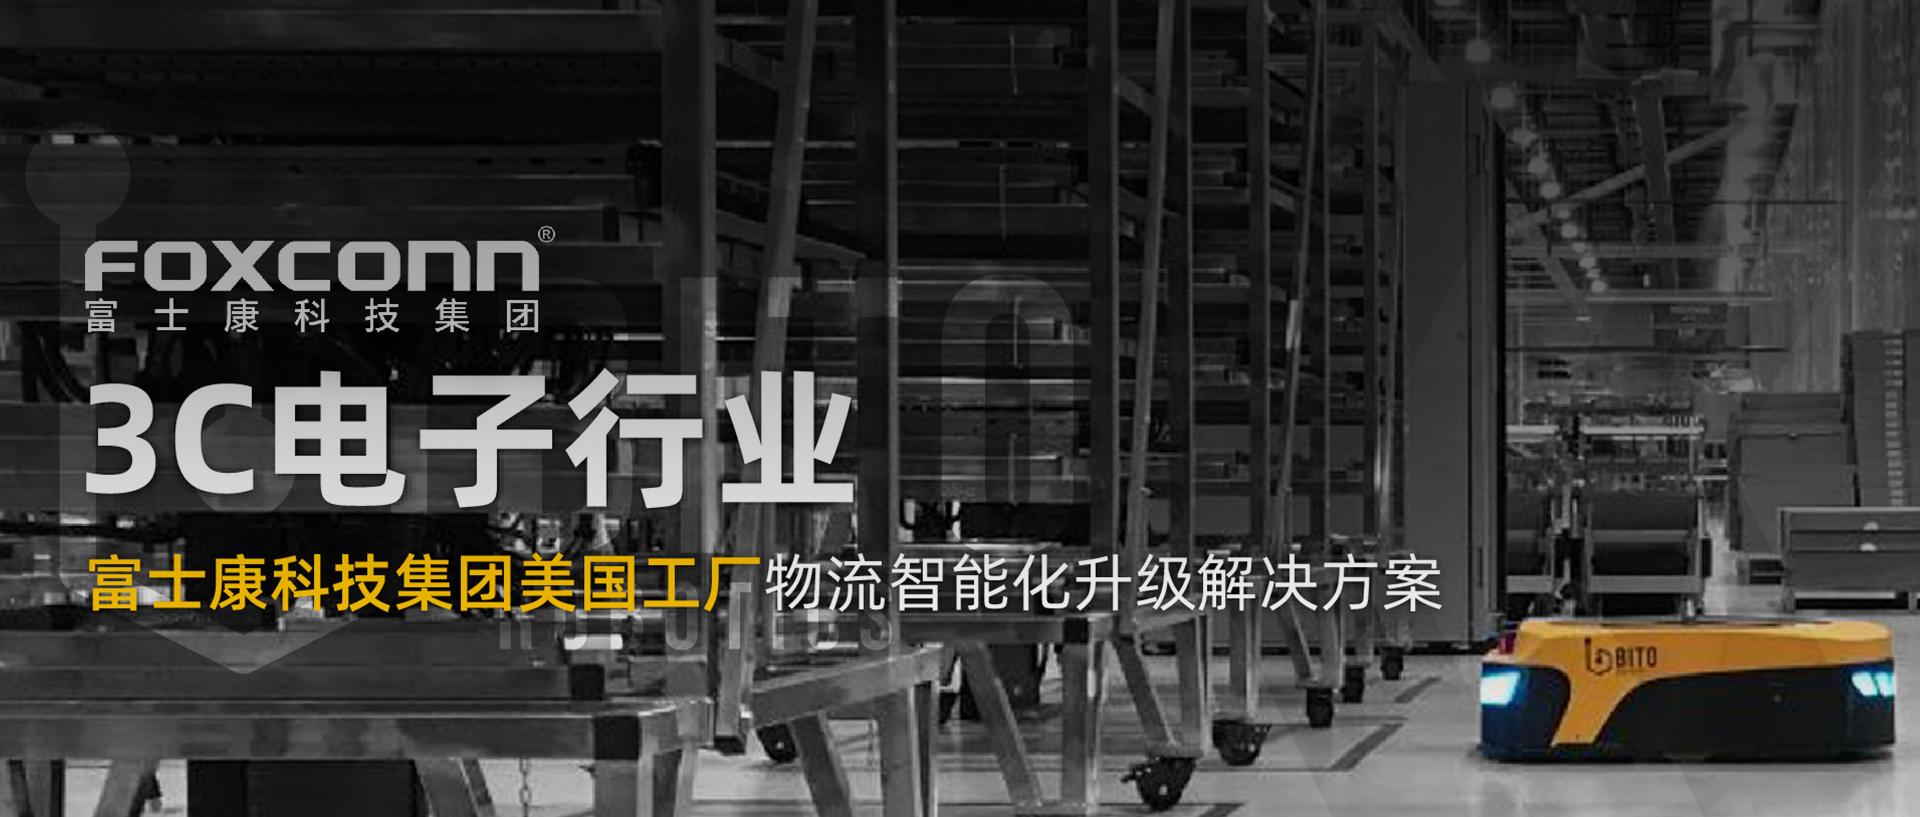 3C电子行业案例 | 富士康科技集团美国工厂物流智能化升级解决方案